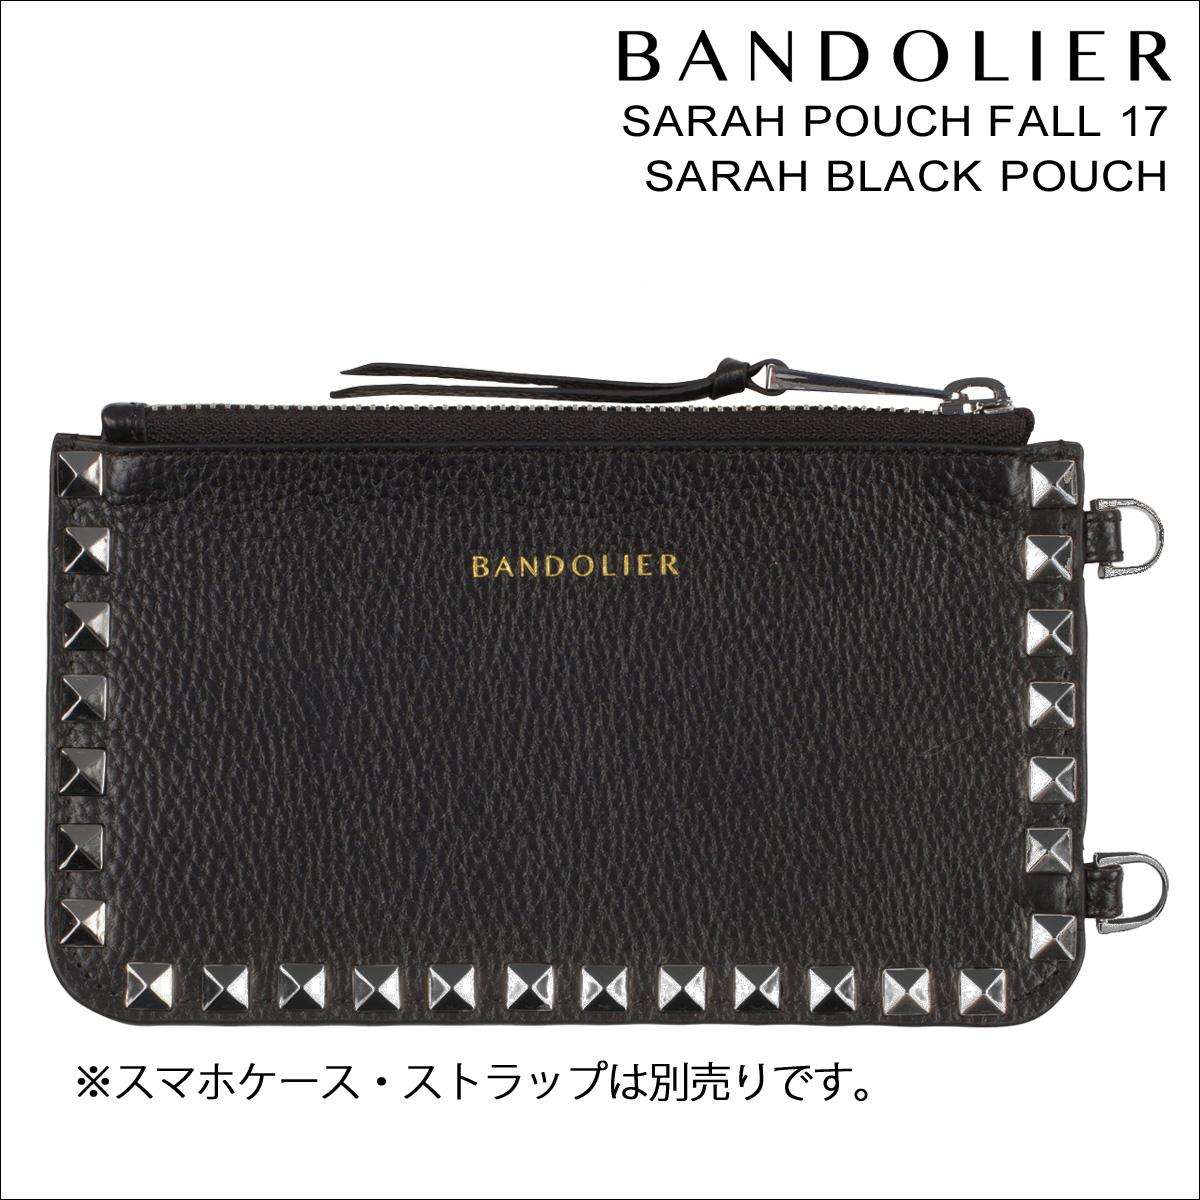 BANDOLIER バンドリヤー ポーチ ケース スマホ 携帯 レザー SARAH POUCH FALL17 メンズ レディース ブラック